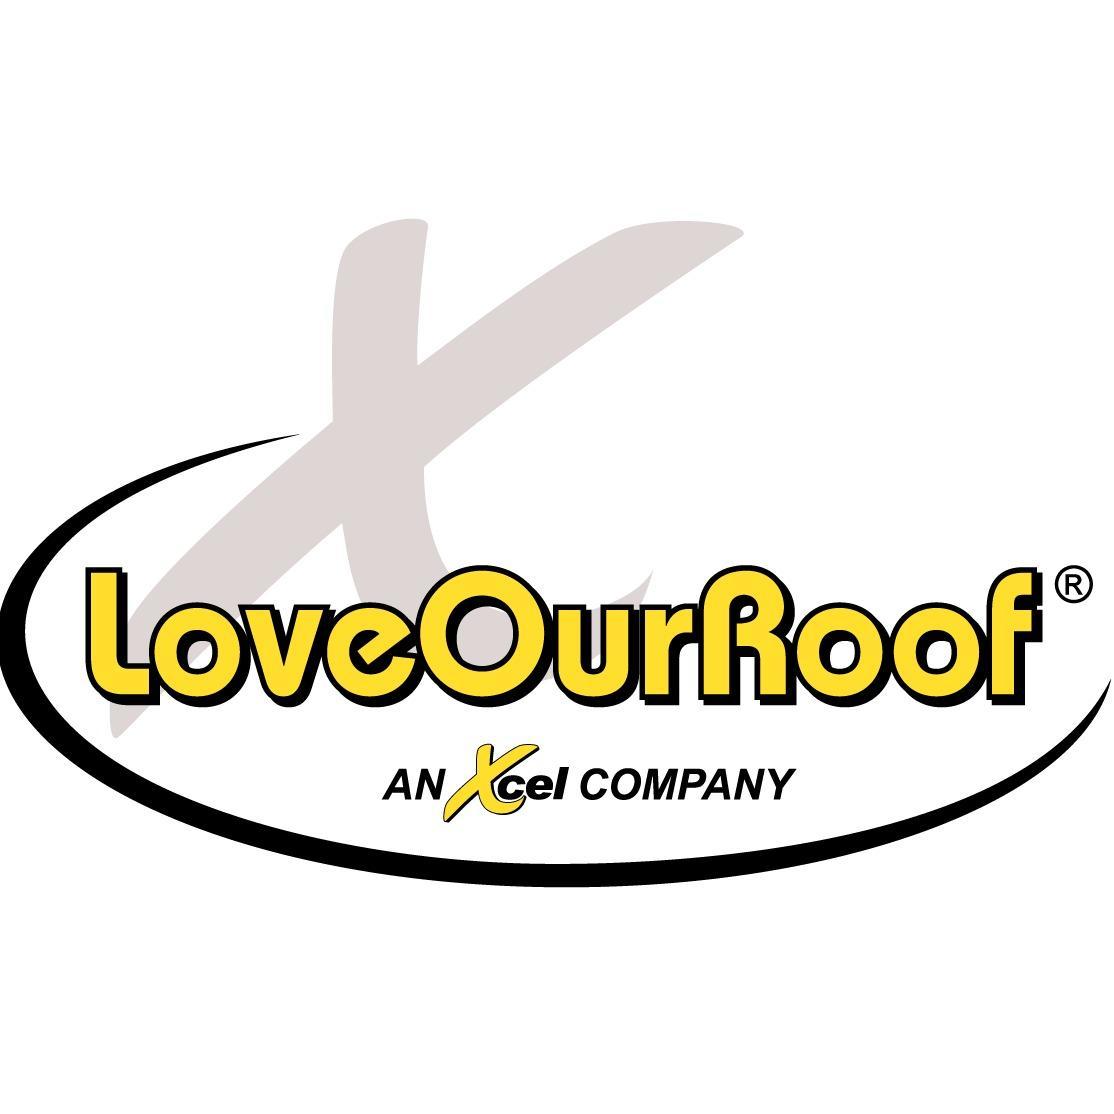 LoveOurRoof, an Xcel Company